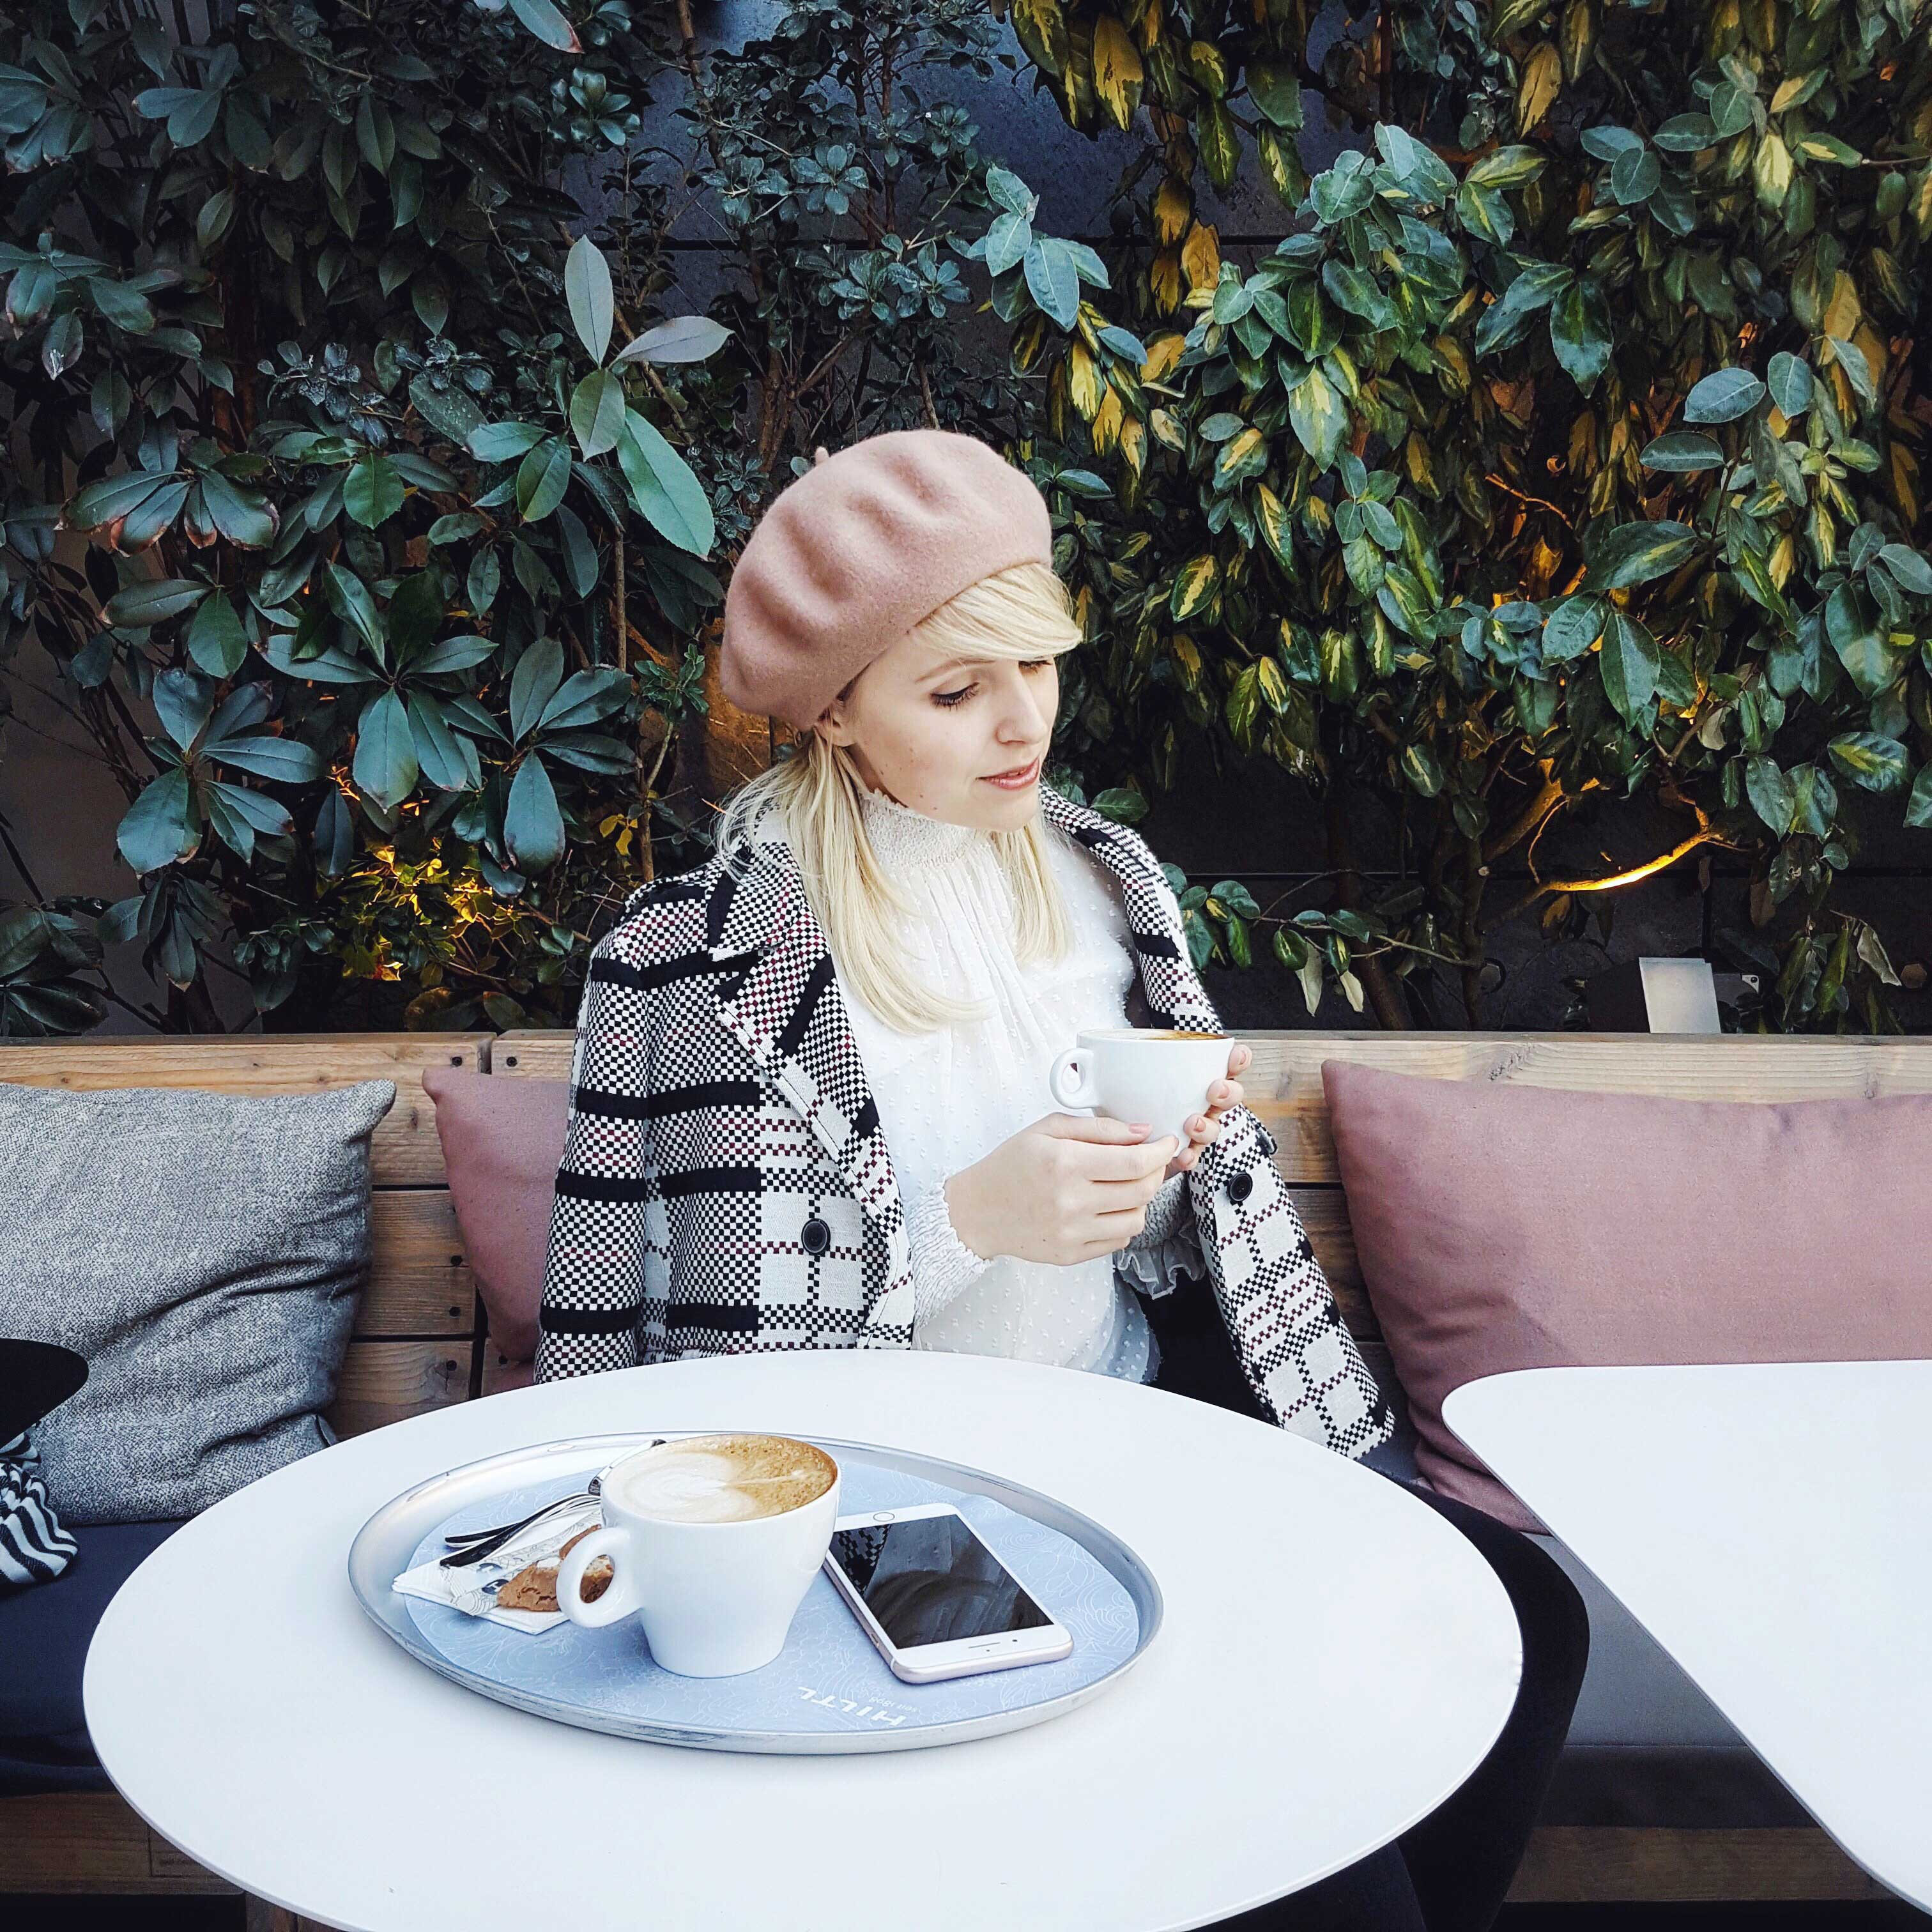 zara_zurich_hilti_coffeetogo_zukkerme_instagram